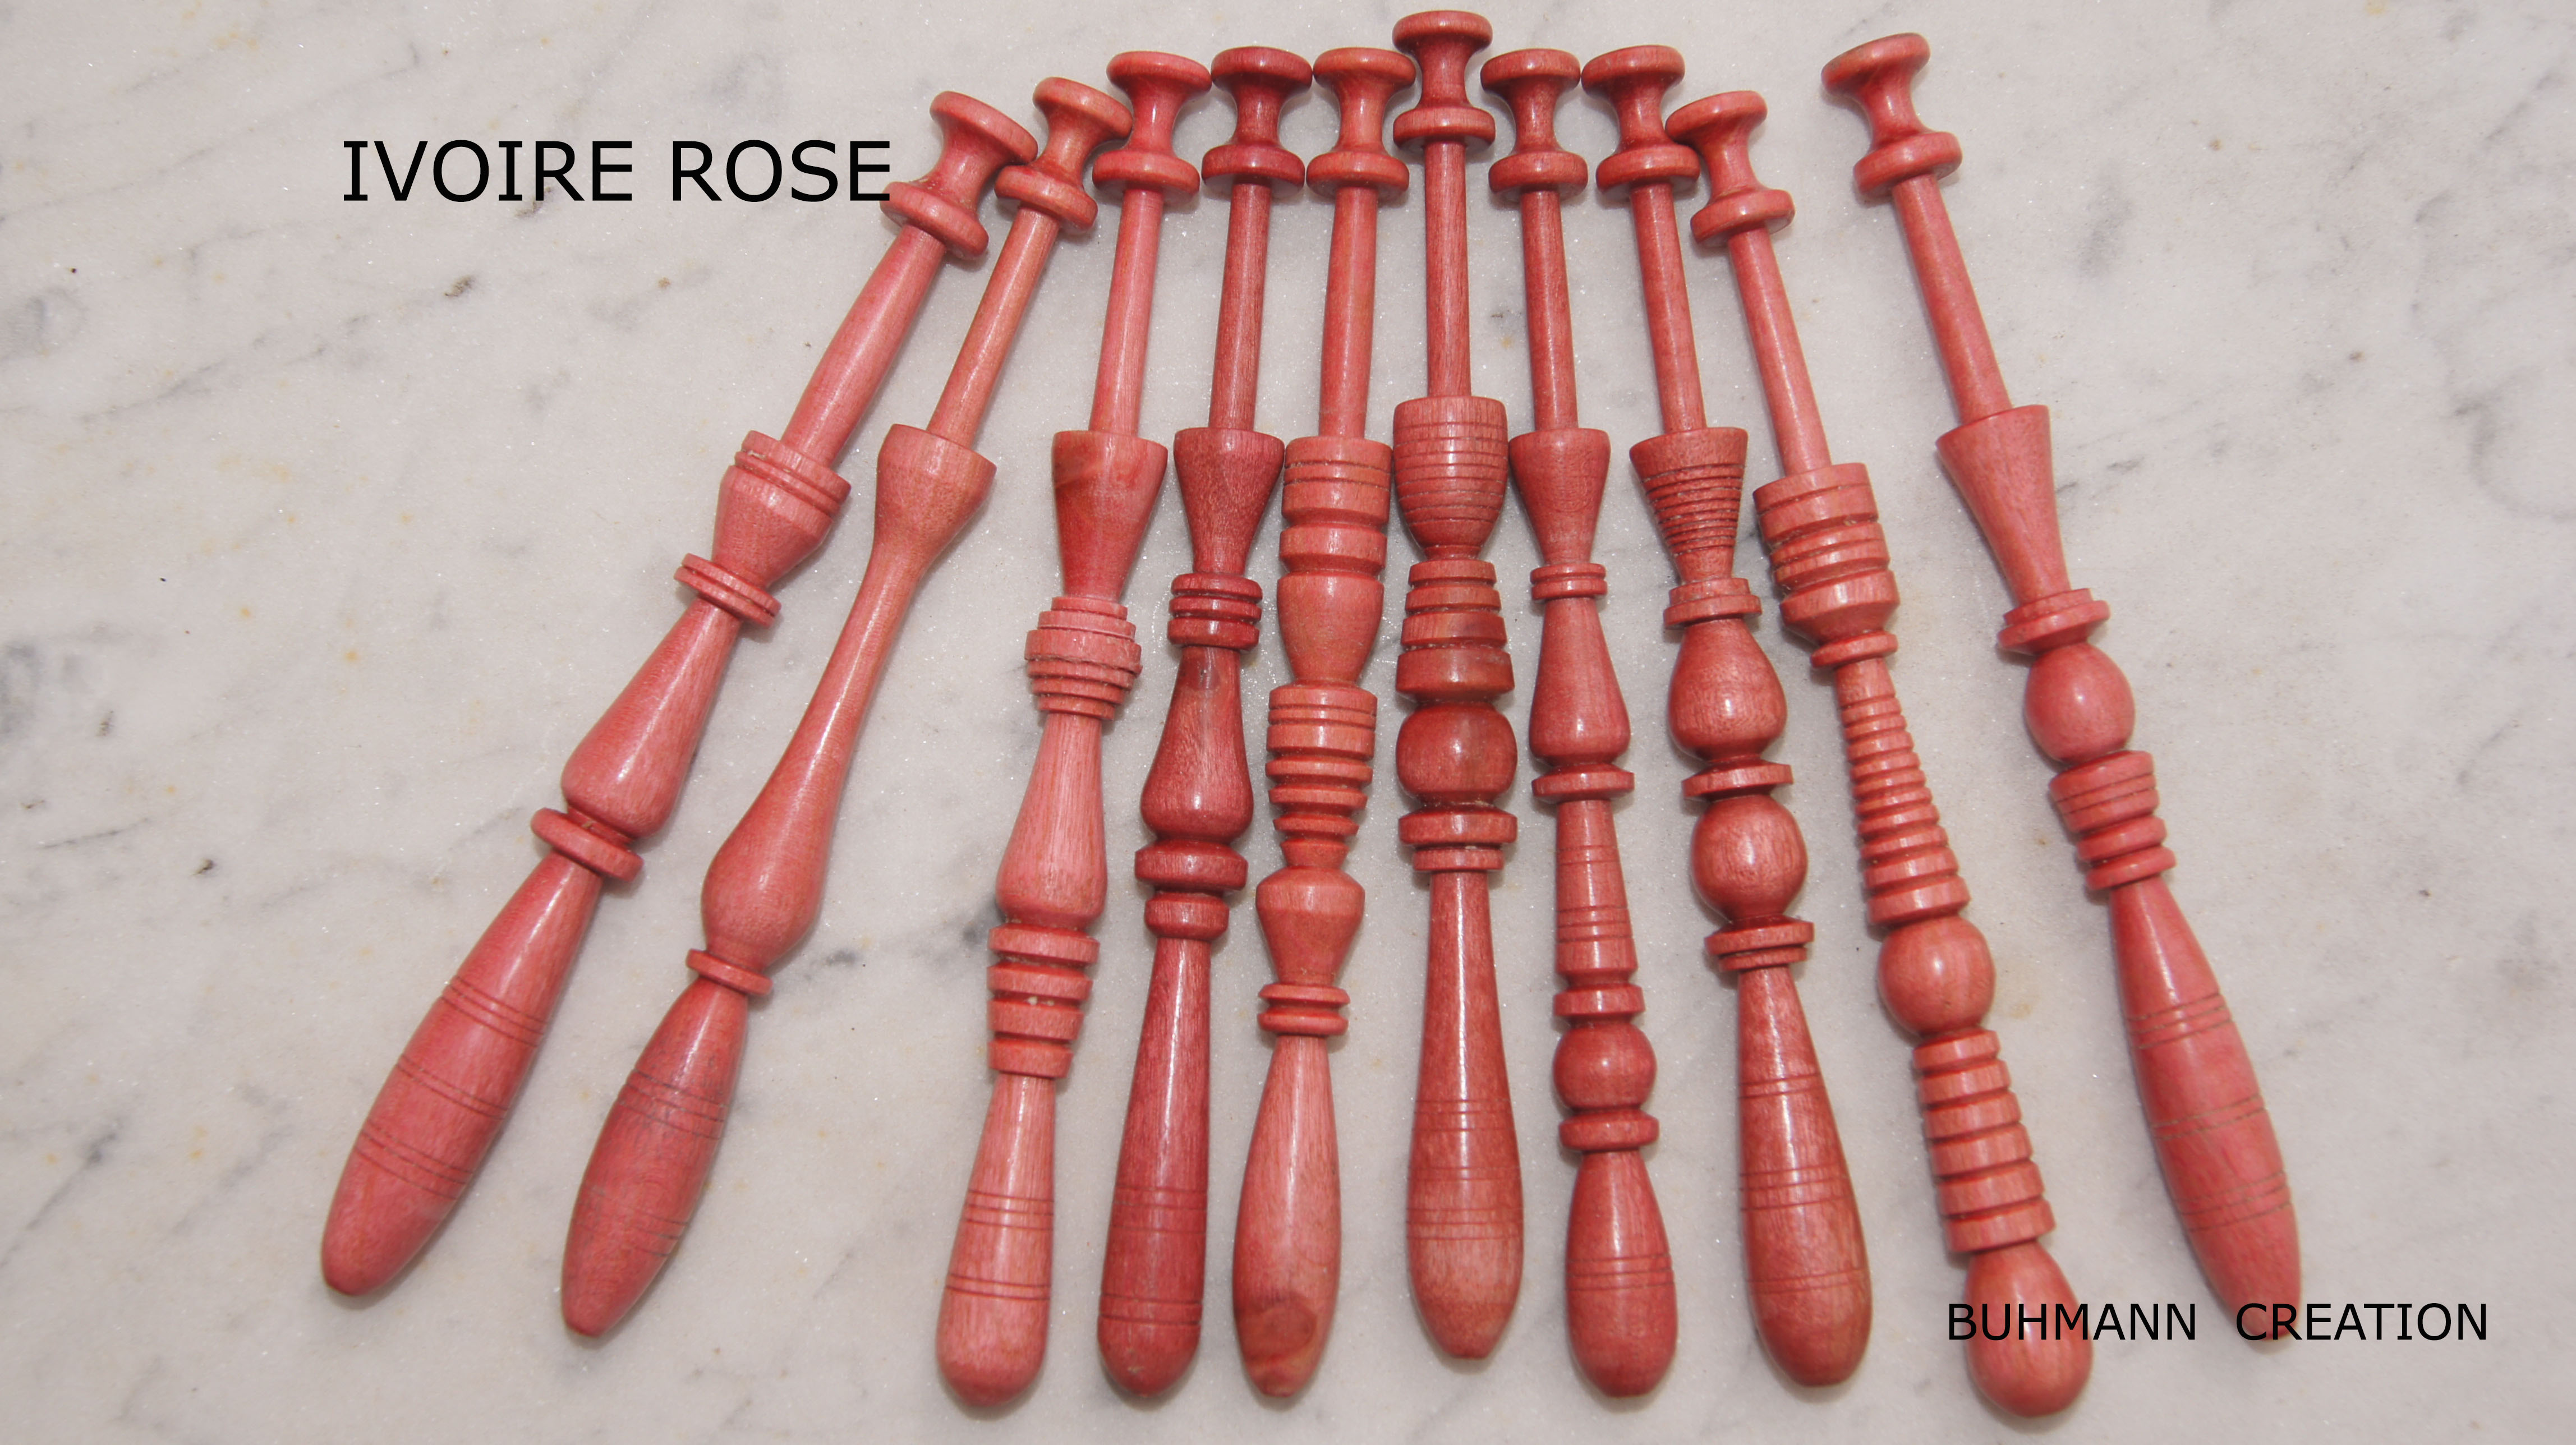 Ivoire rose